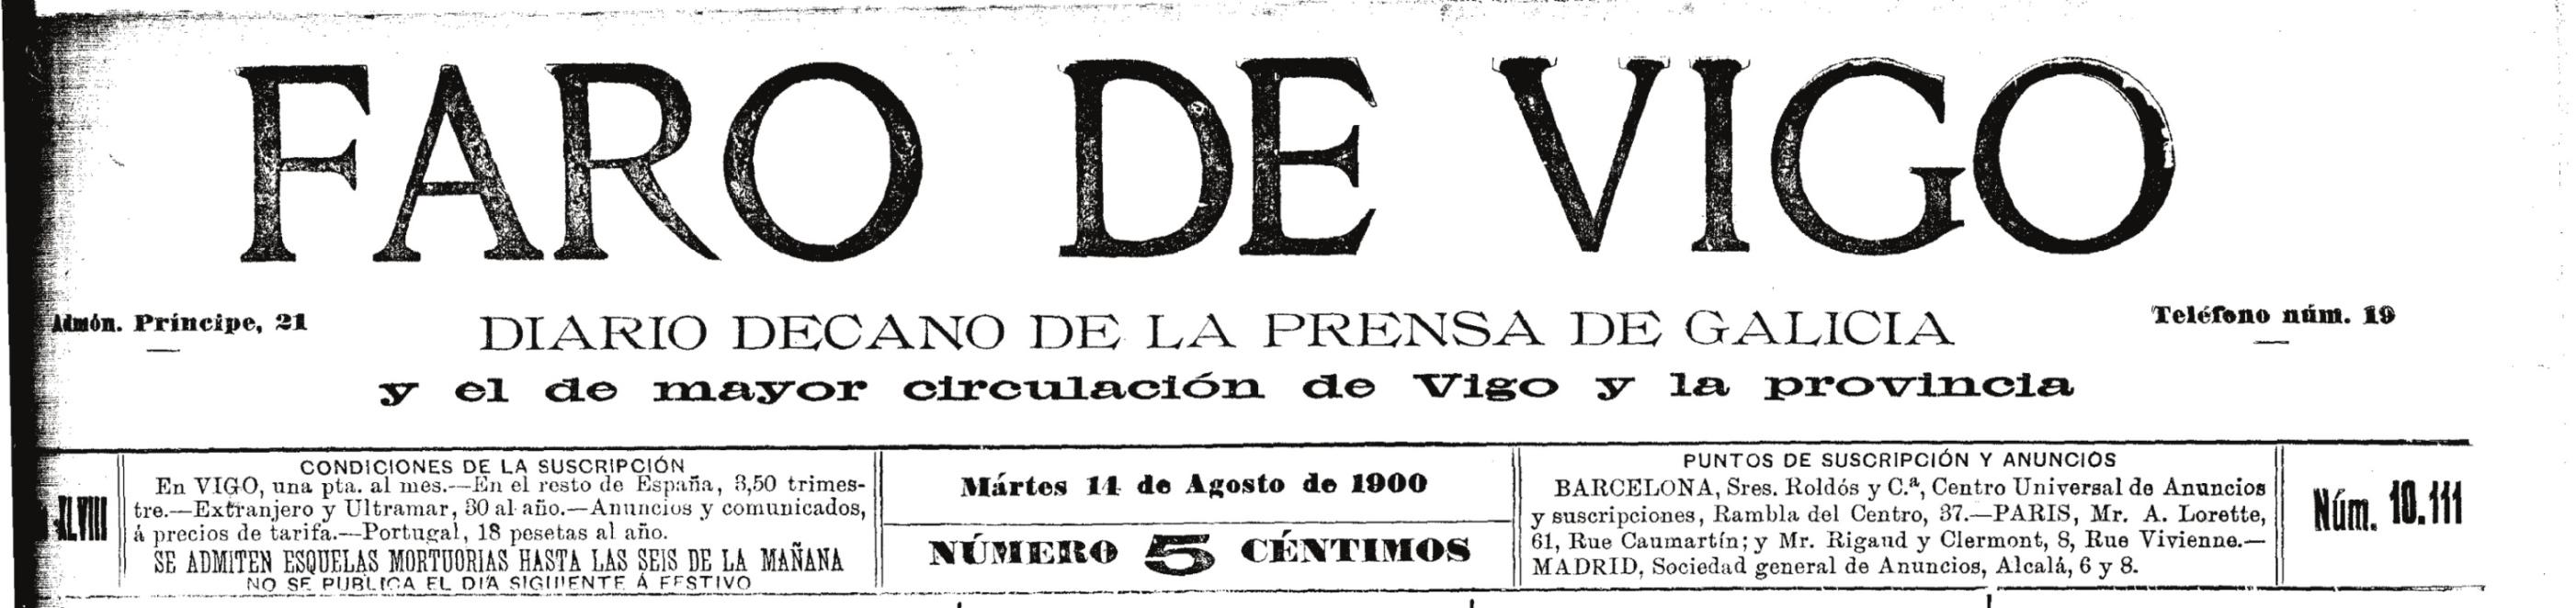 historia da cidade de Vigo